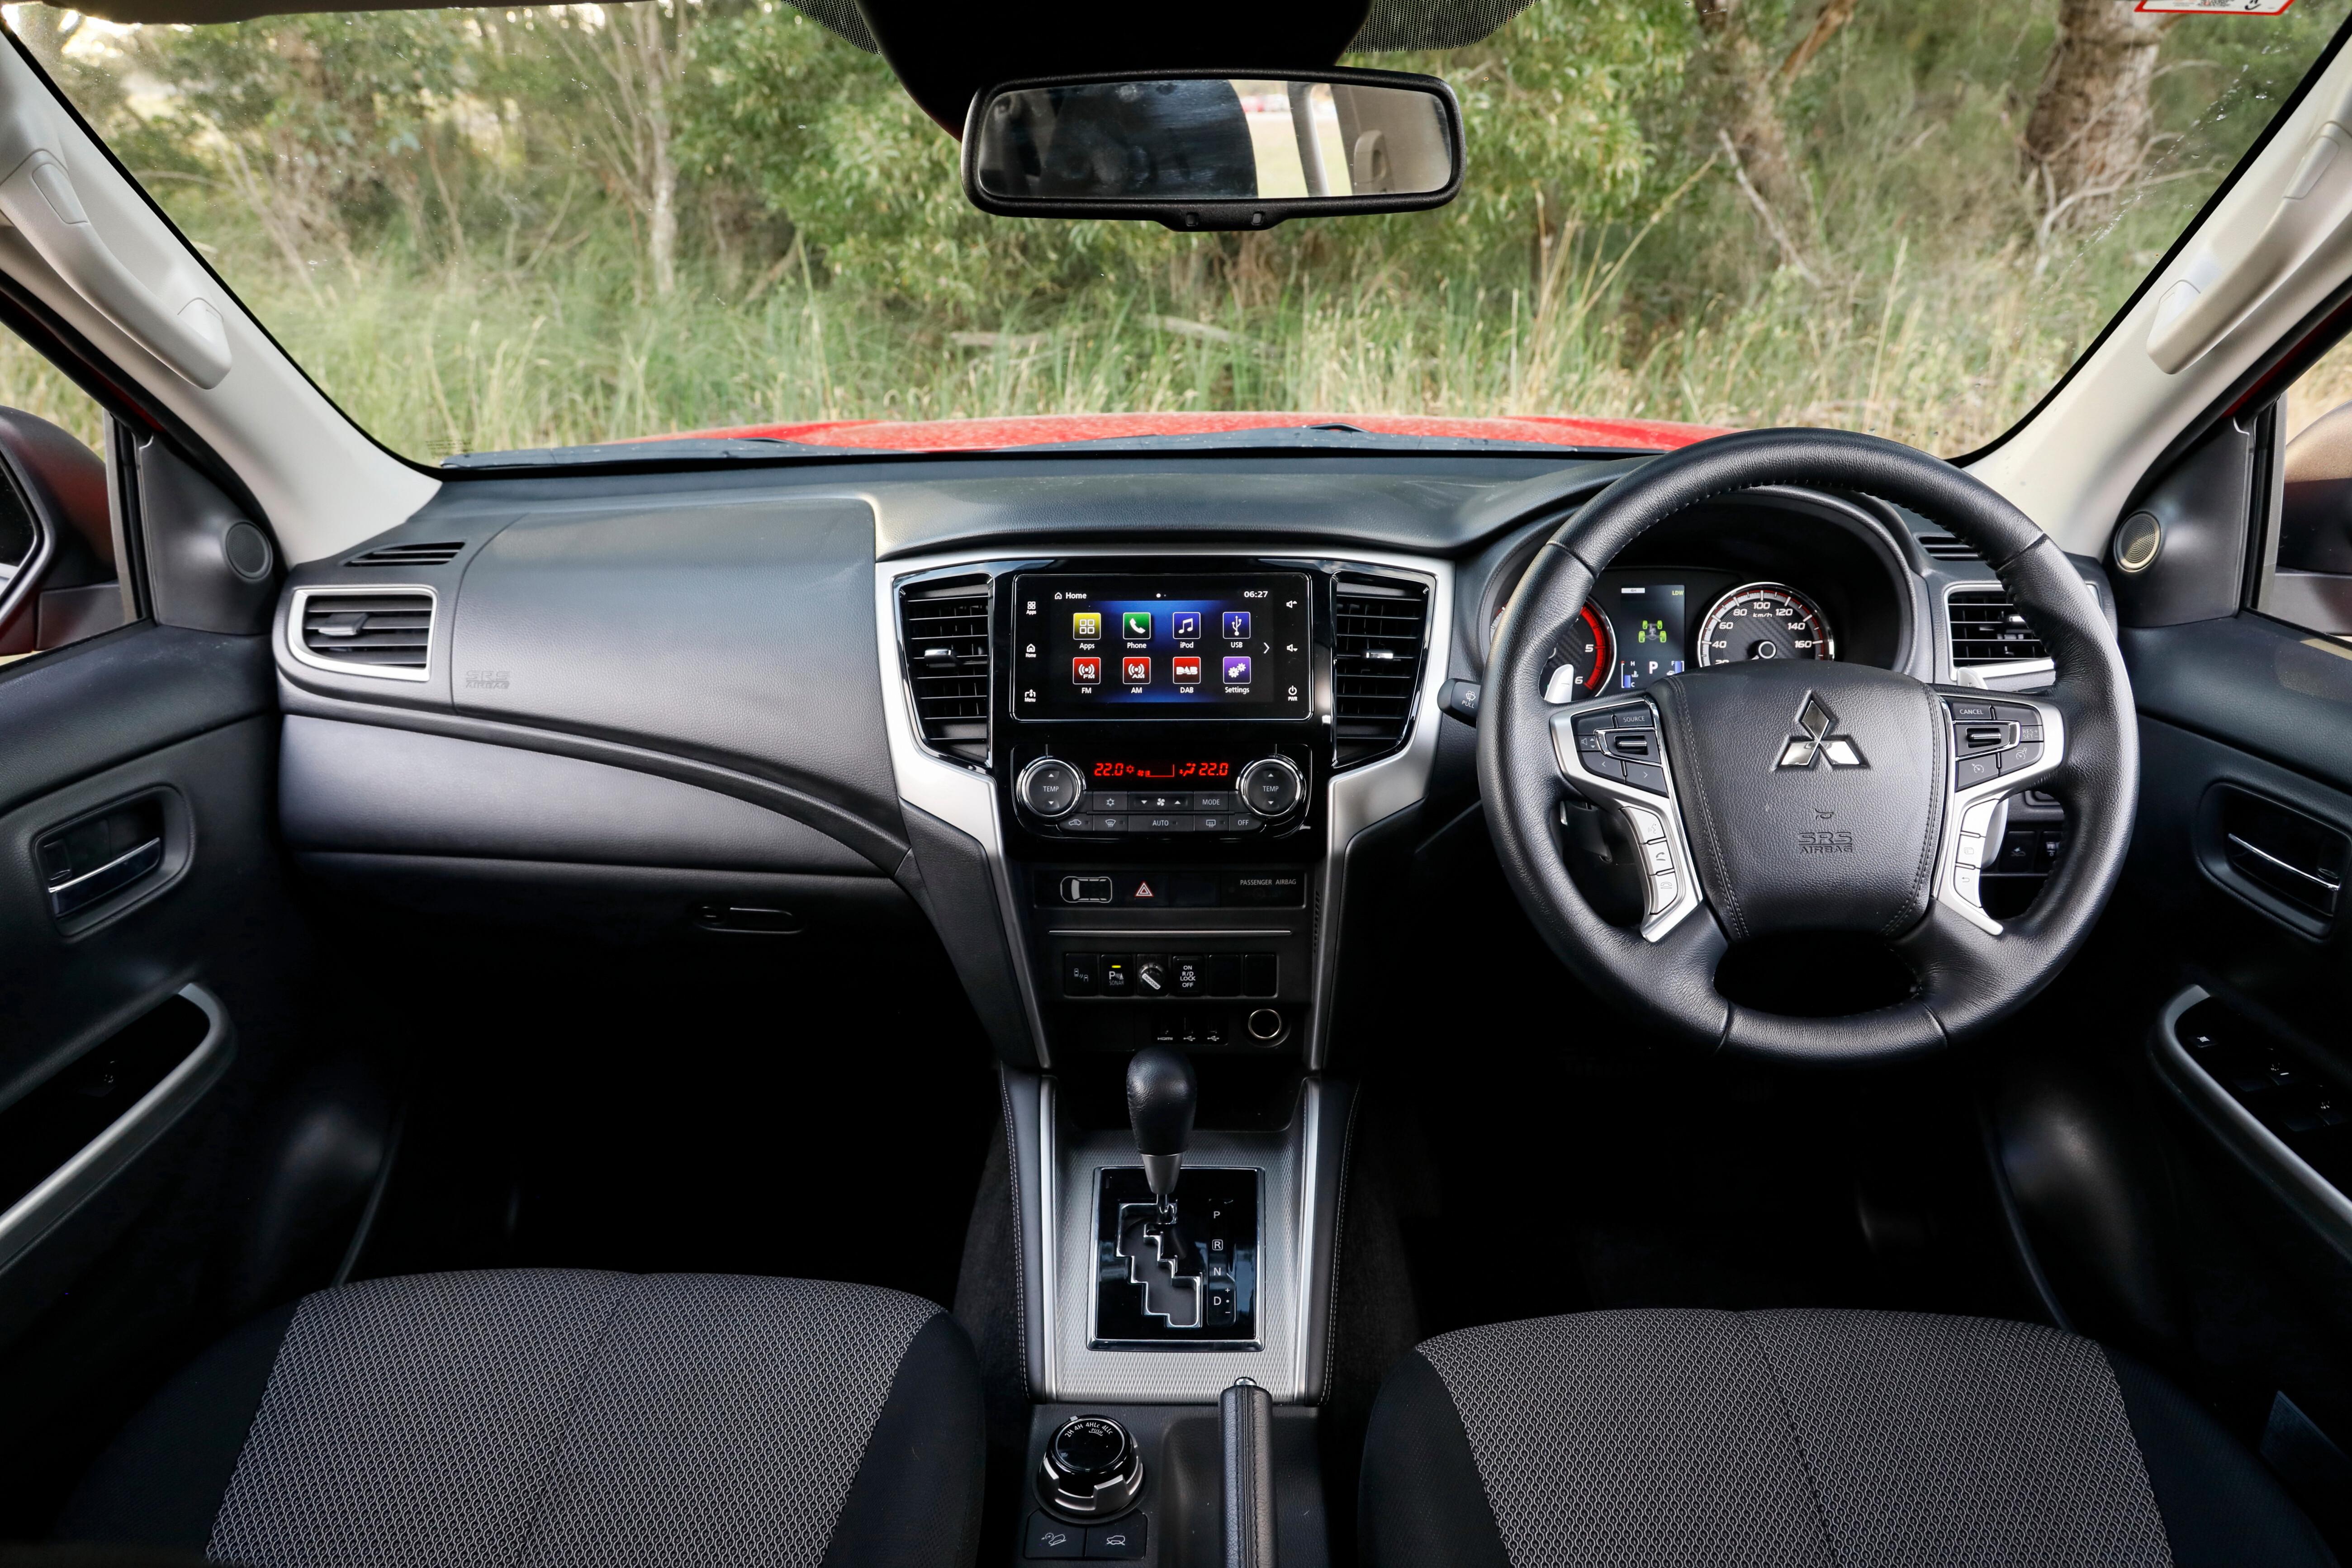 4 X 4 Australia Comparisons 2021 May 21 Mitubishi Triton GLS Interior